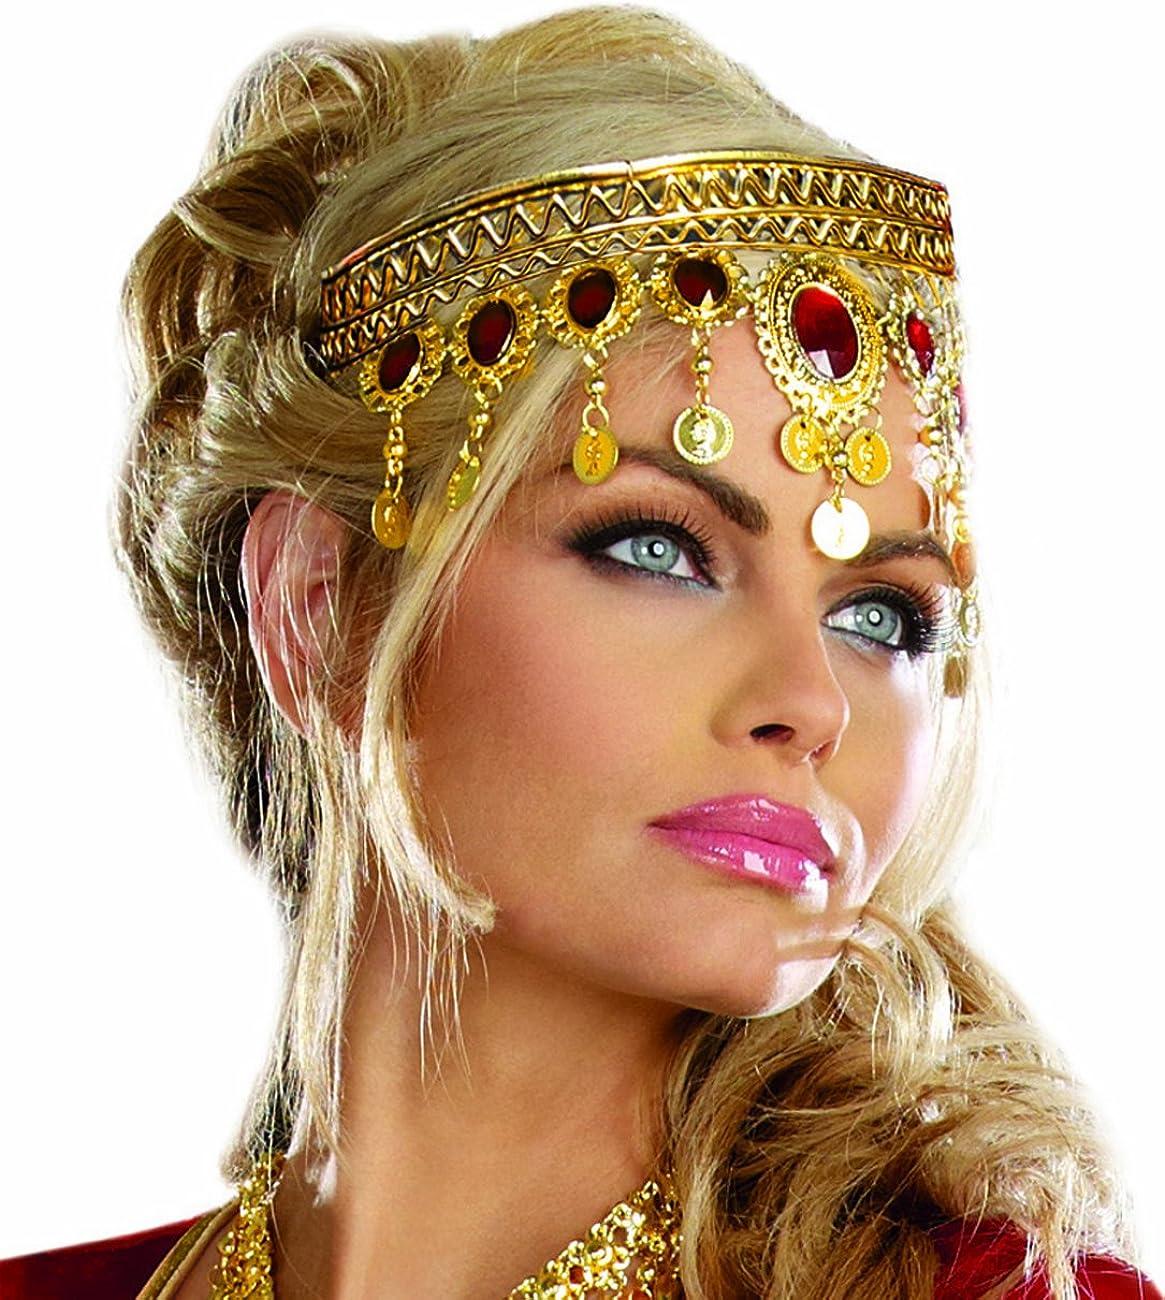 Dreamgirl Women's Dripping Rubies Headpiece